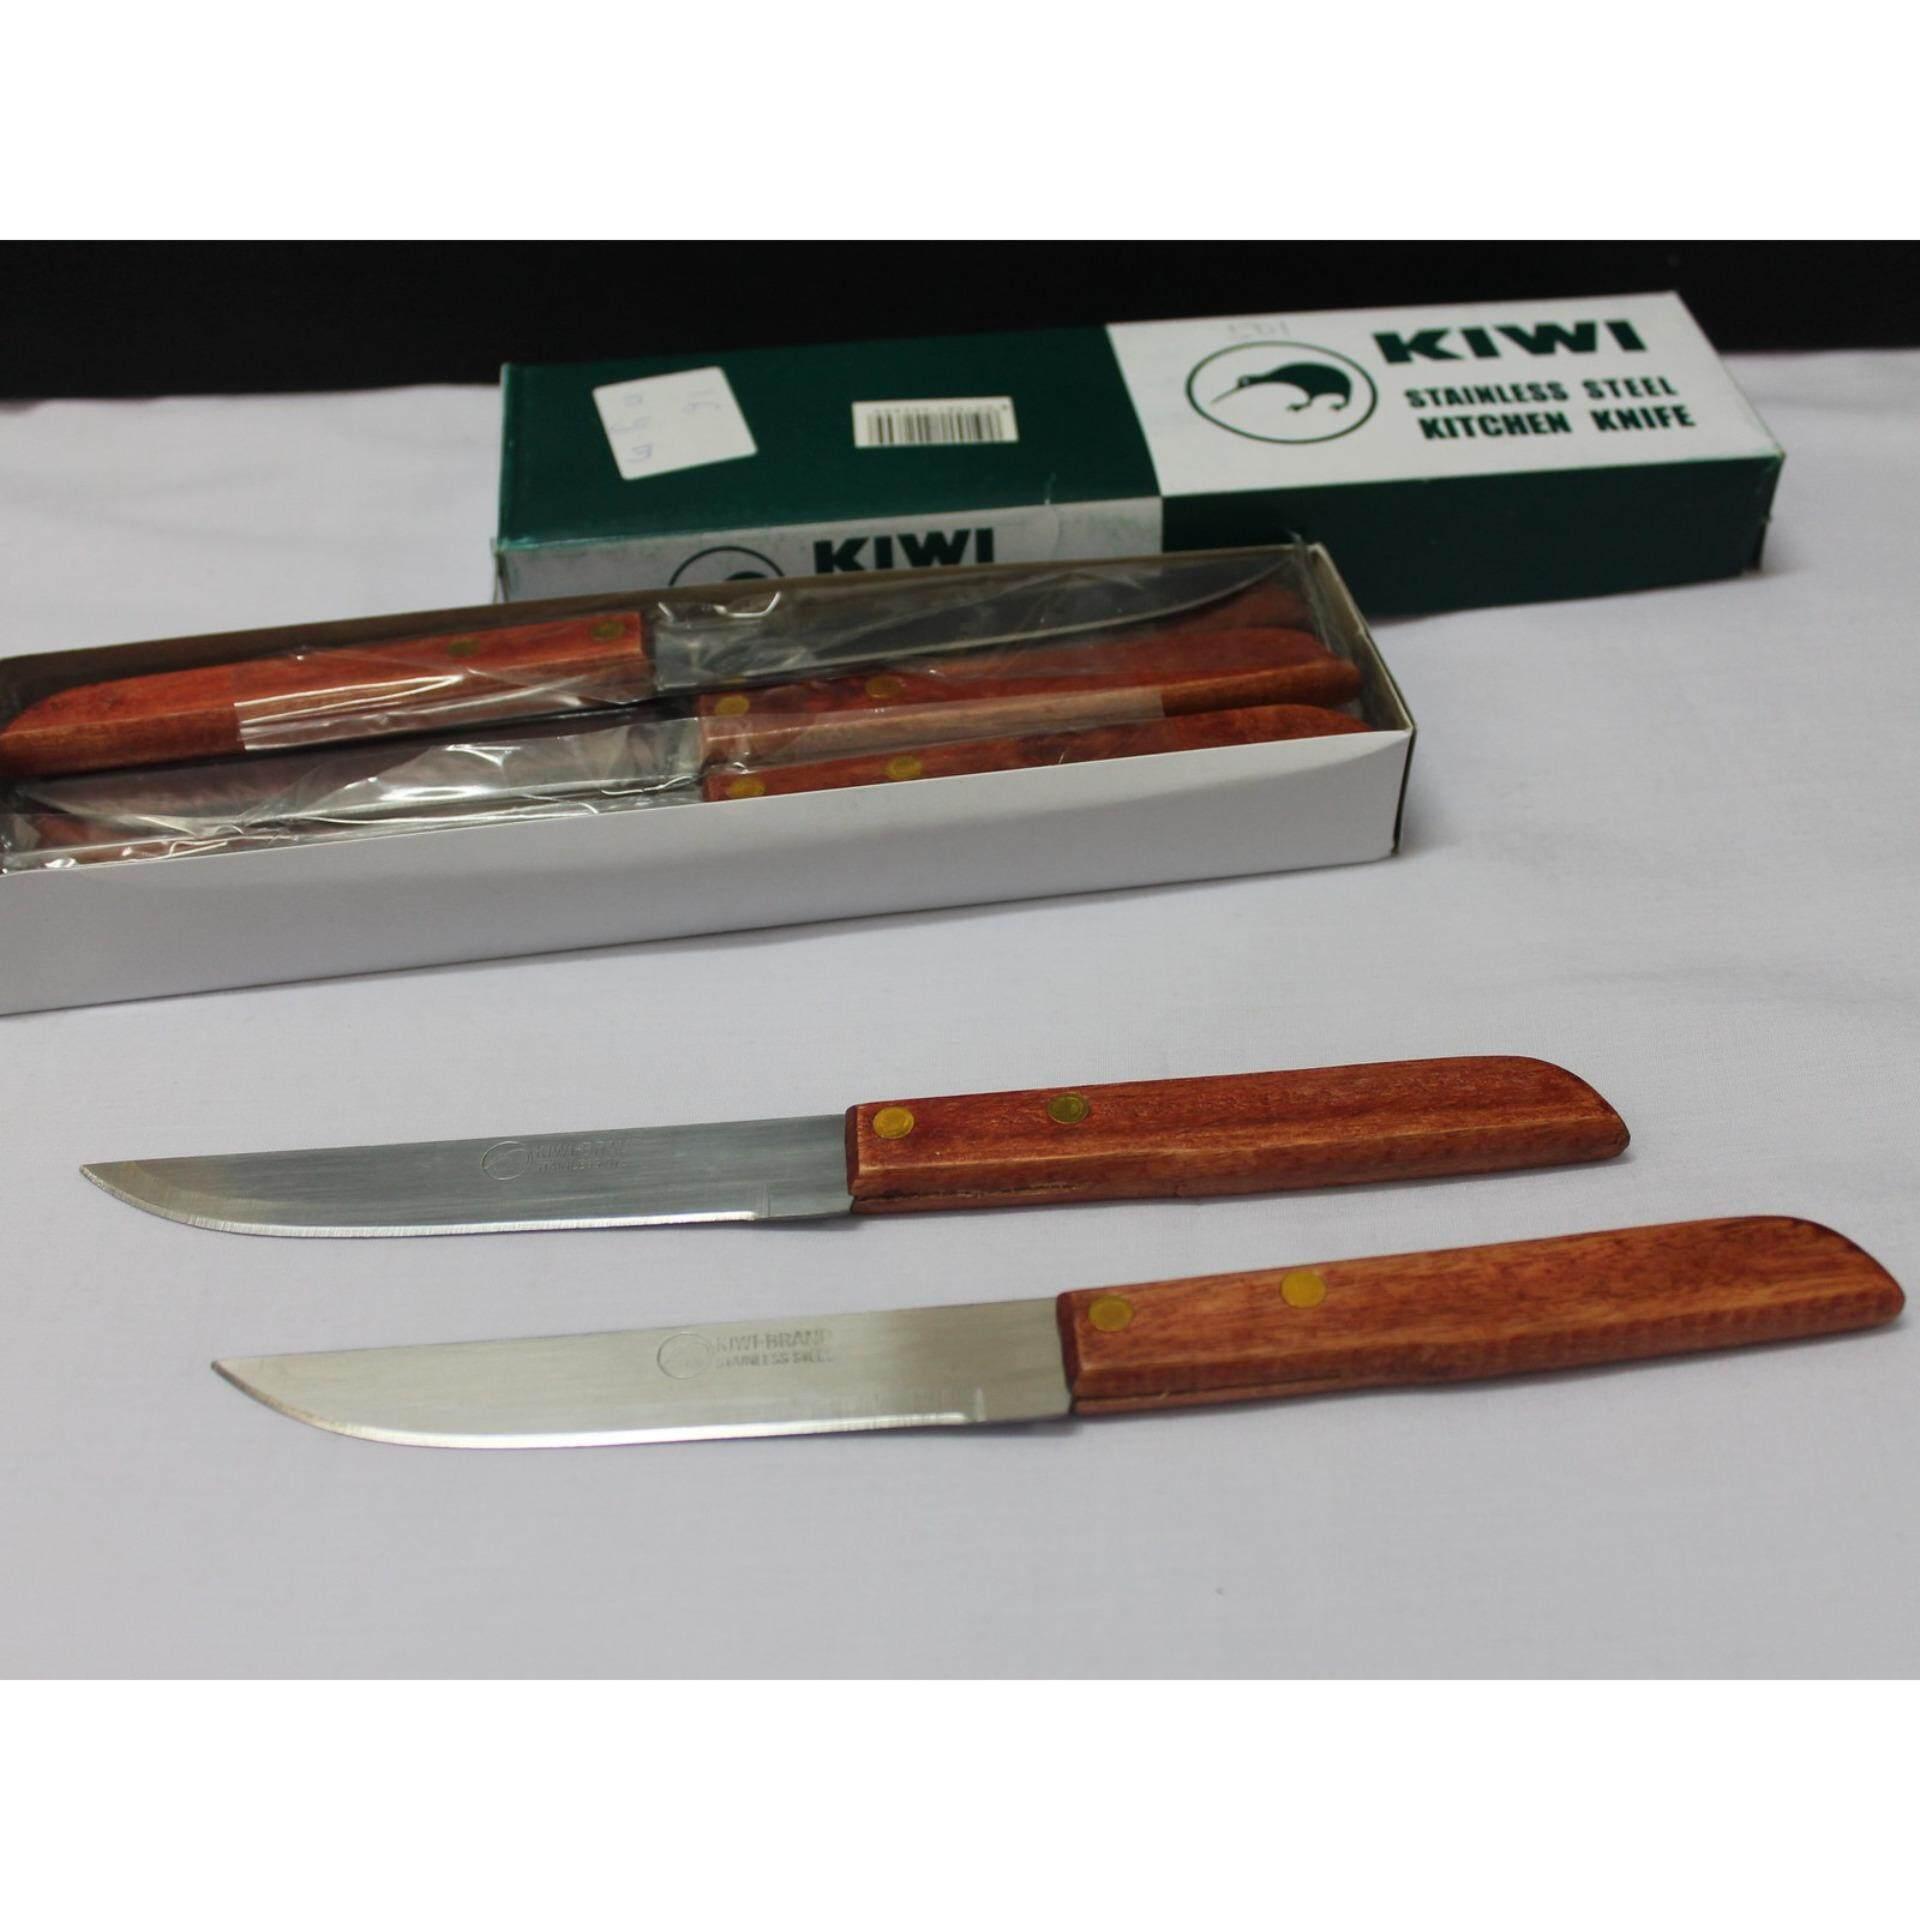 1pc Kiwi 12cm Fruit Vegetable Knife with Wood Handler